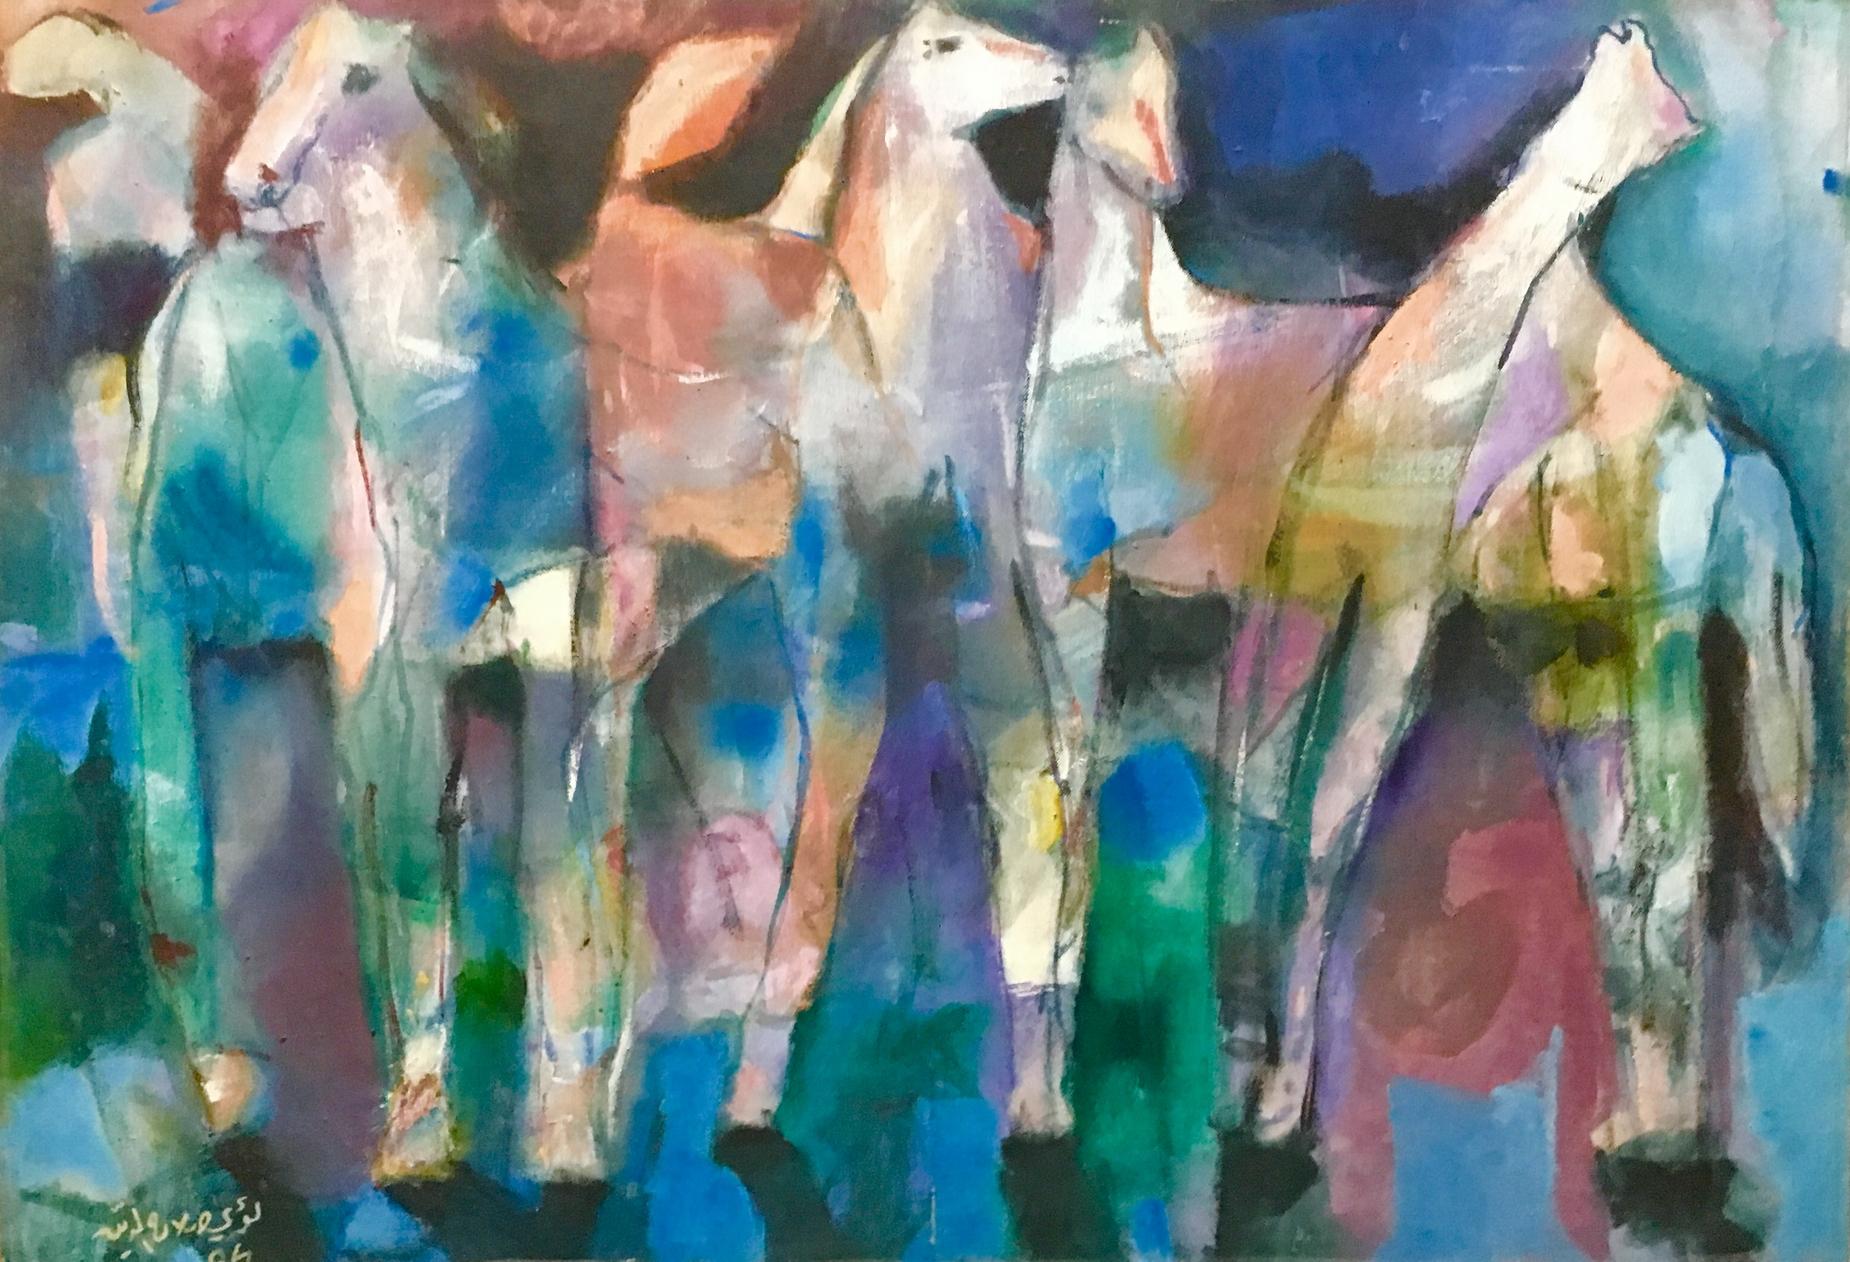 169_313 - (c) Artist loai salahedeen 100 in 70 oil on canvas  - الفنان لؤي صلاح الدين -.JPG